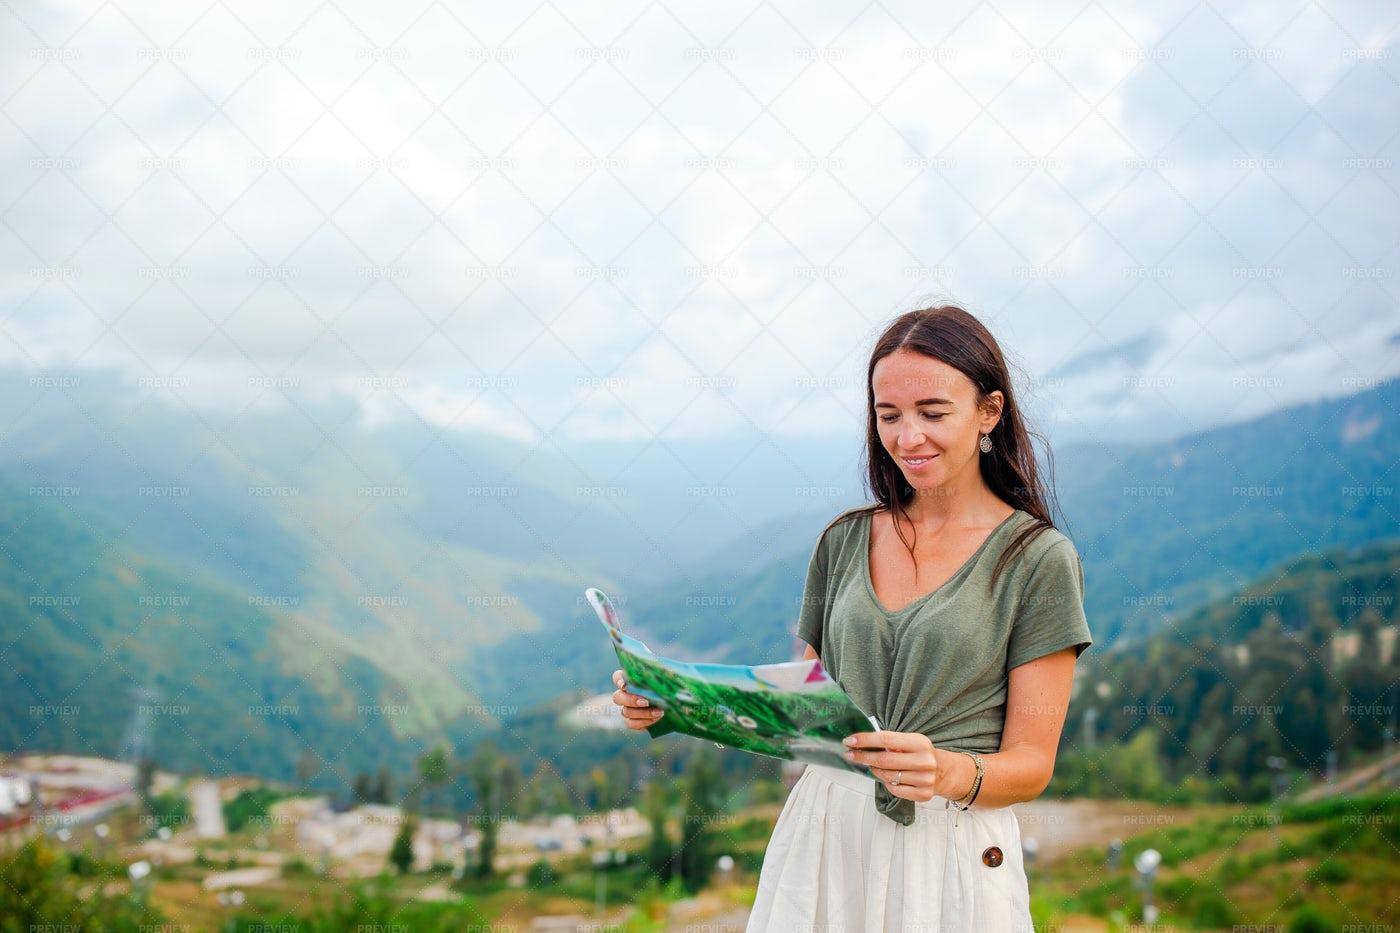 Woman Reading A Map: Stock Photos